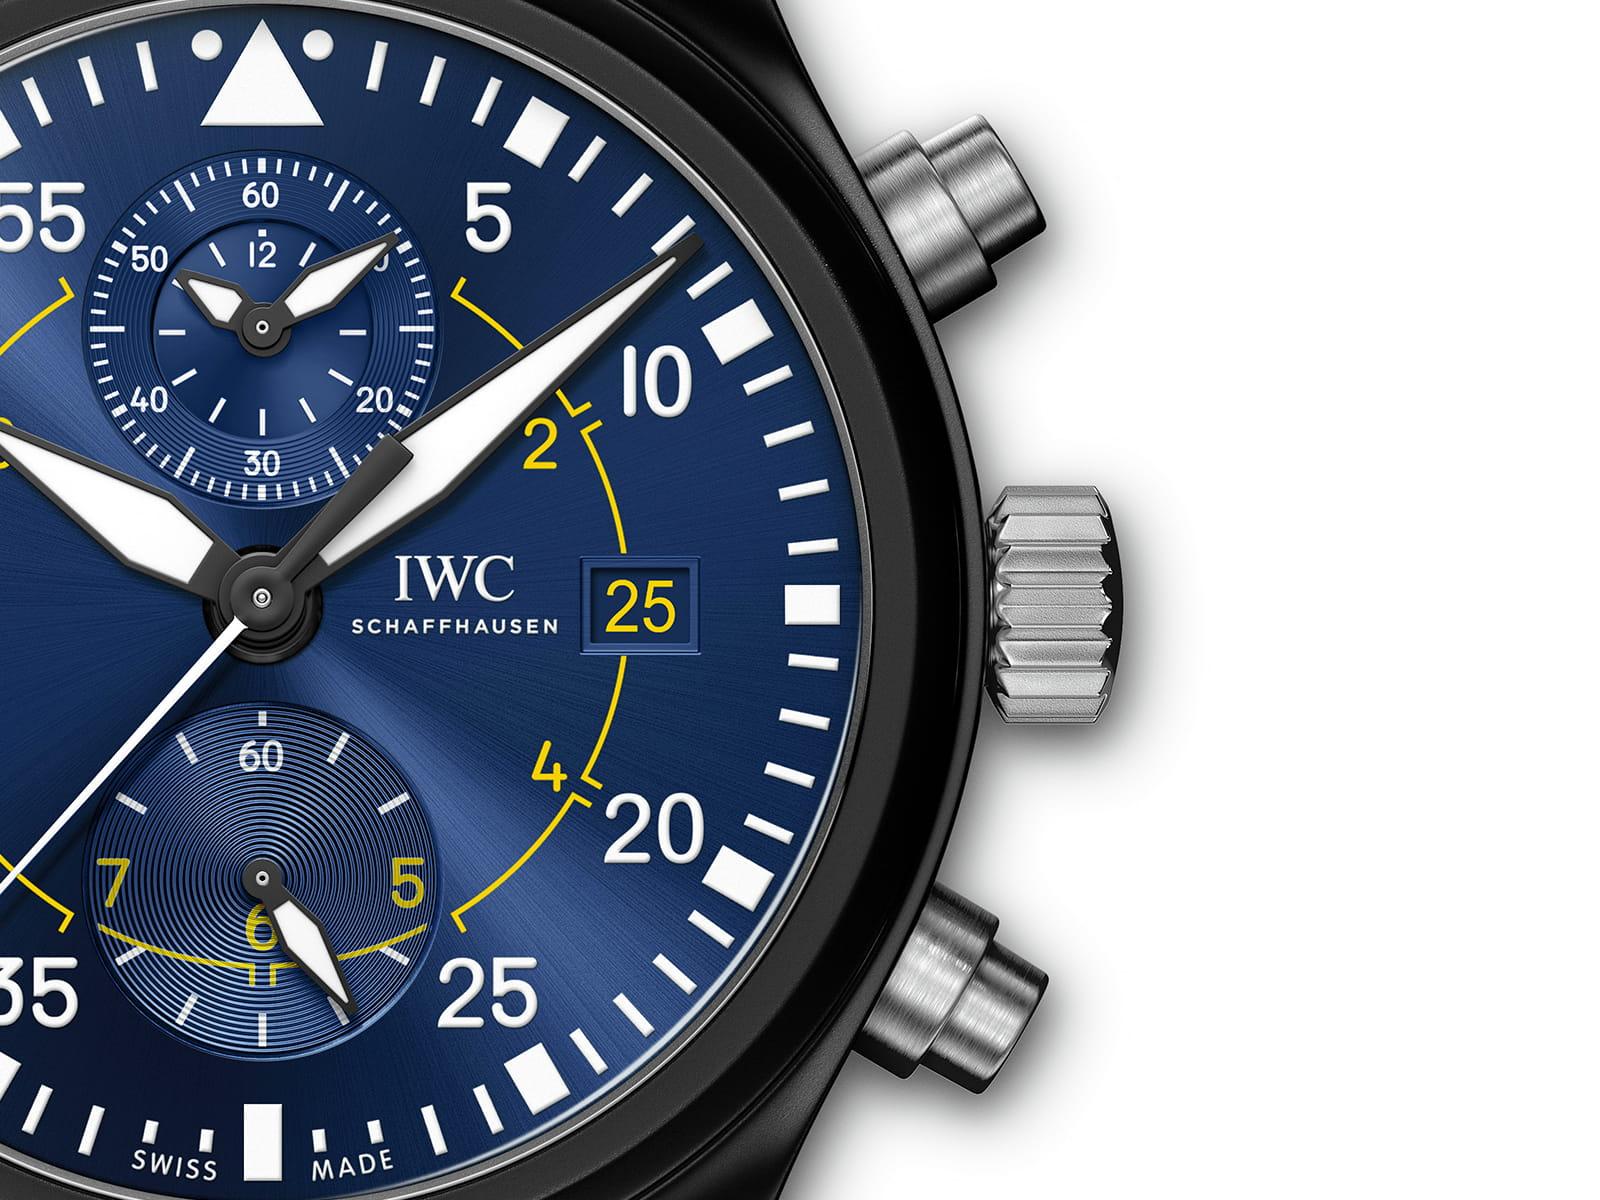 iw389008-iwc-schaffhausen-pilot-s-watch-chronograph-edition-blue-angels-4.jpg